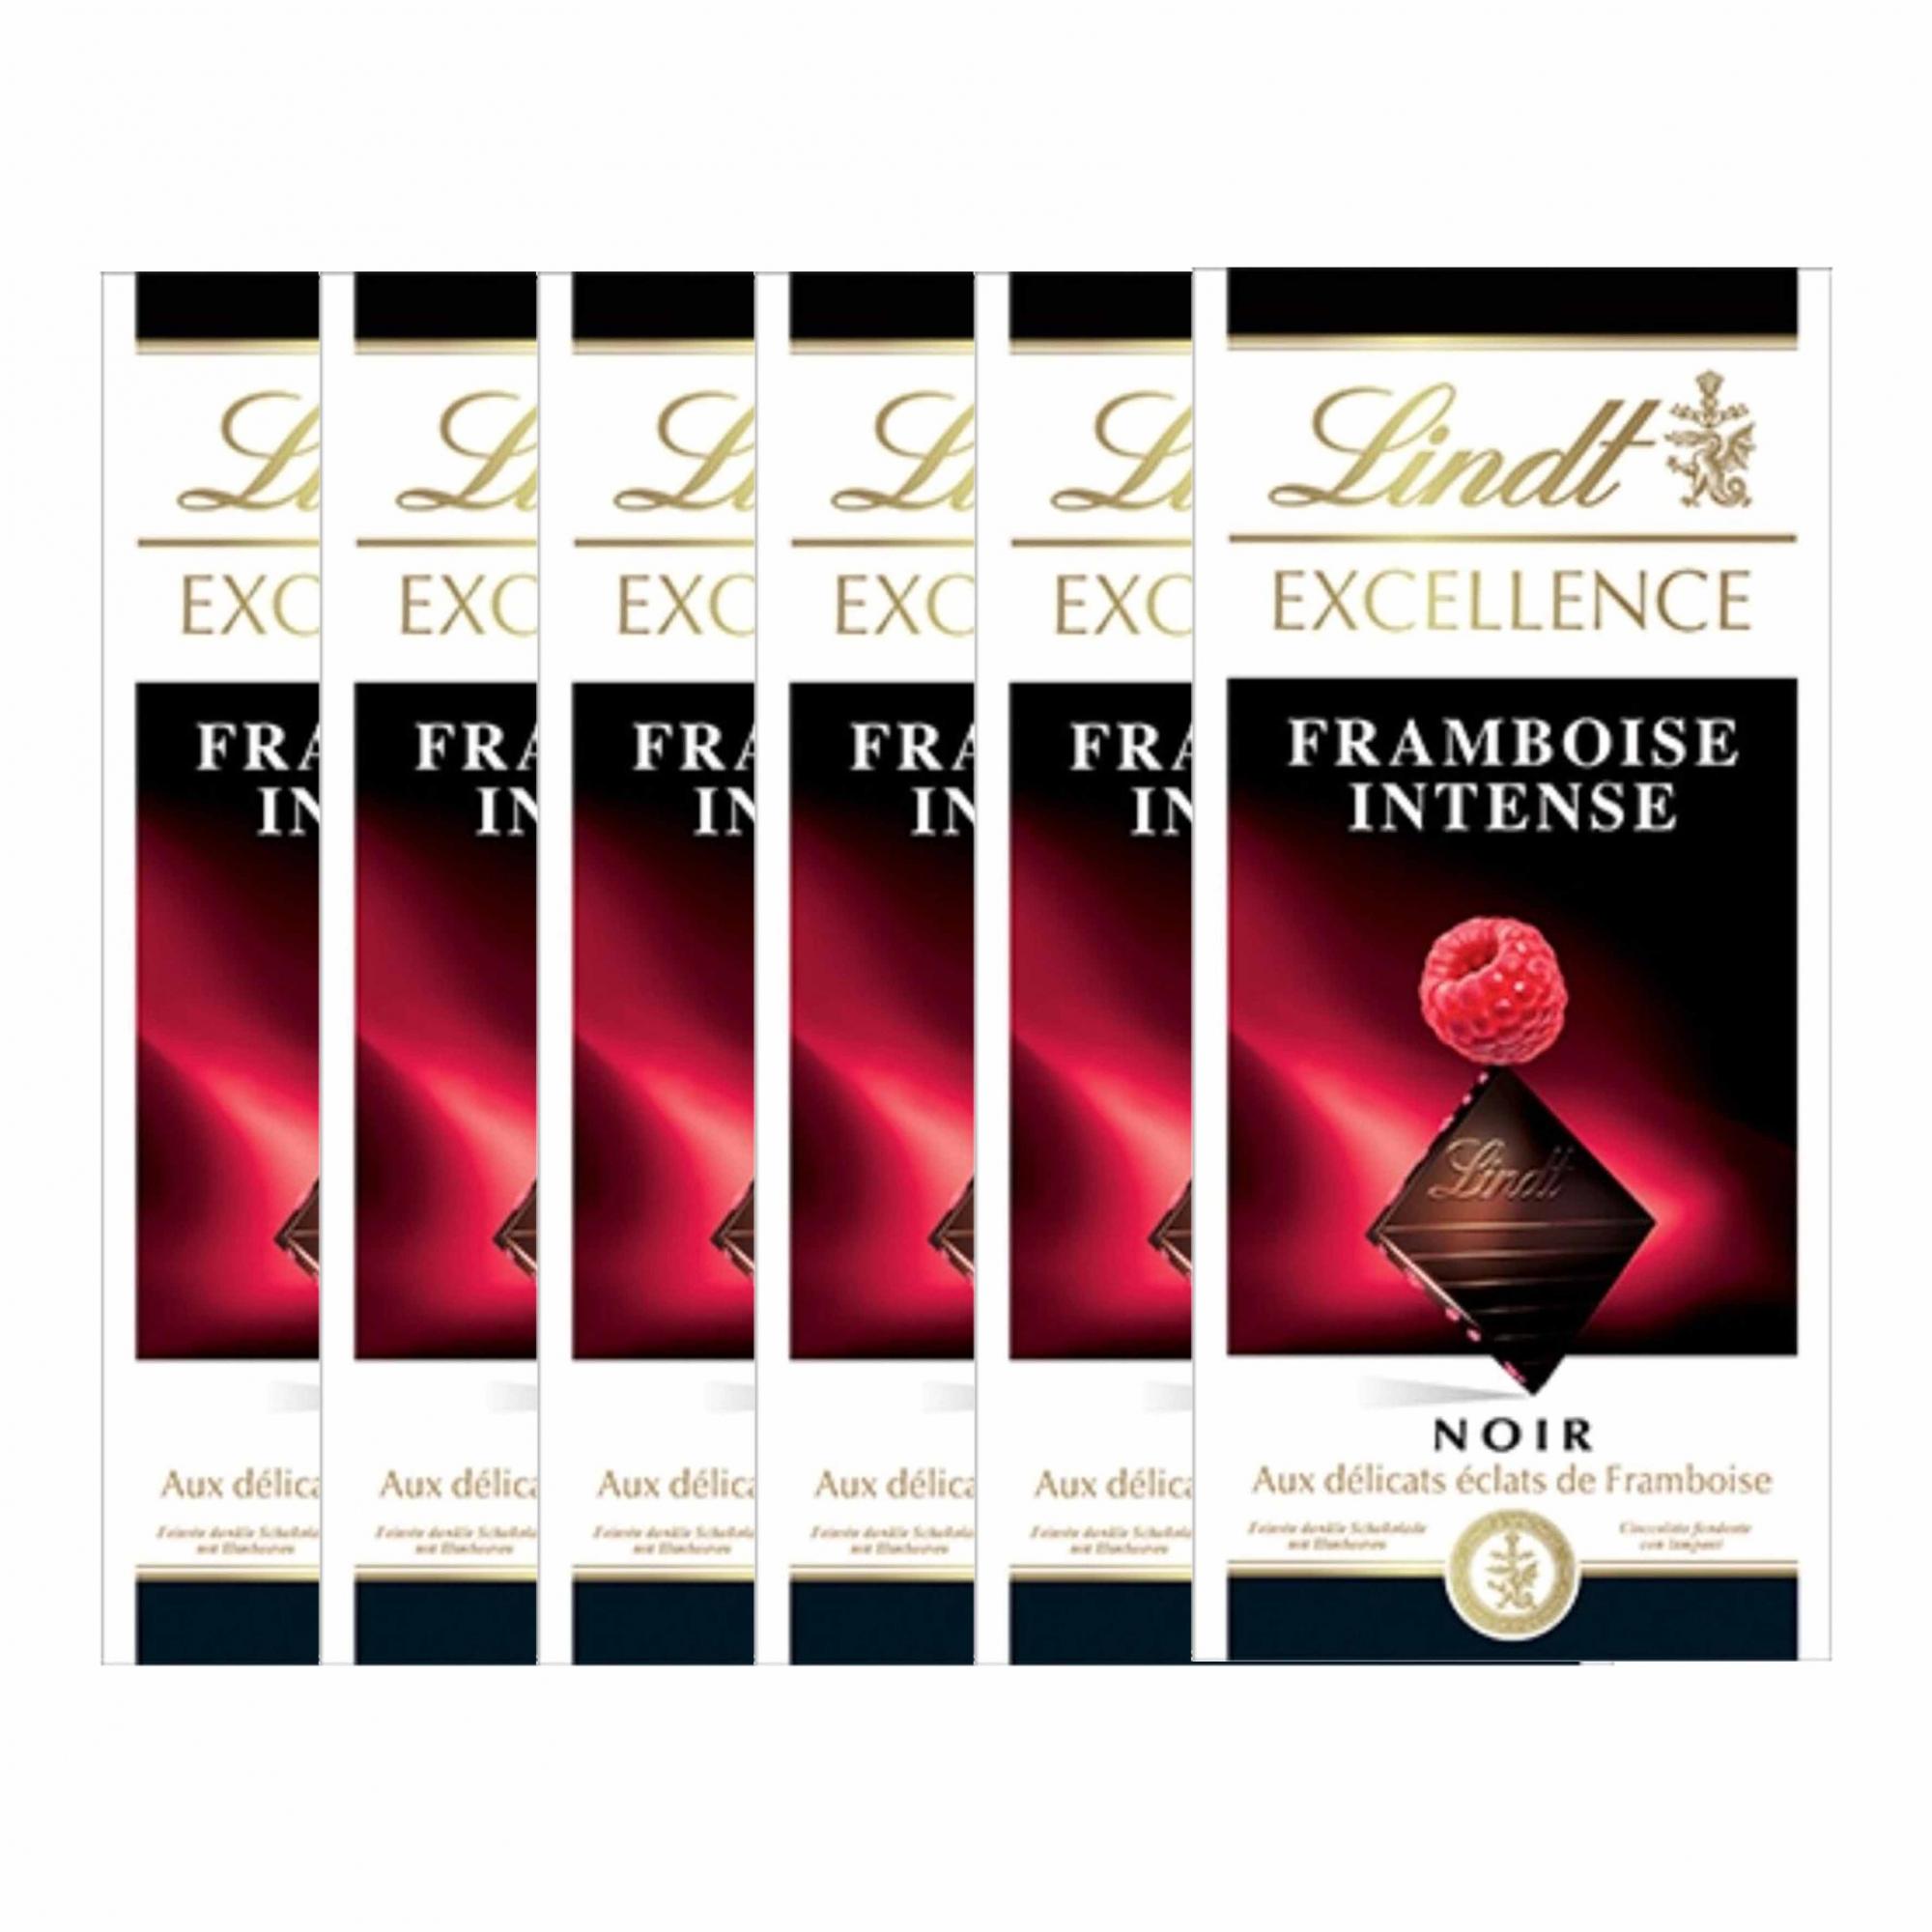 Kit 6x Barra de Chocolate Lindt Excellence Framboesa Intense 100g Dark